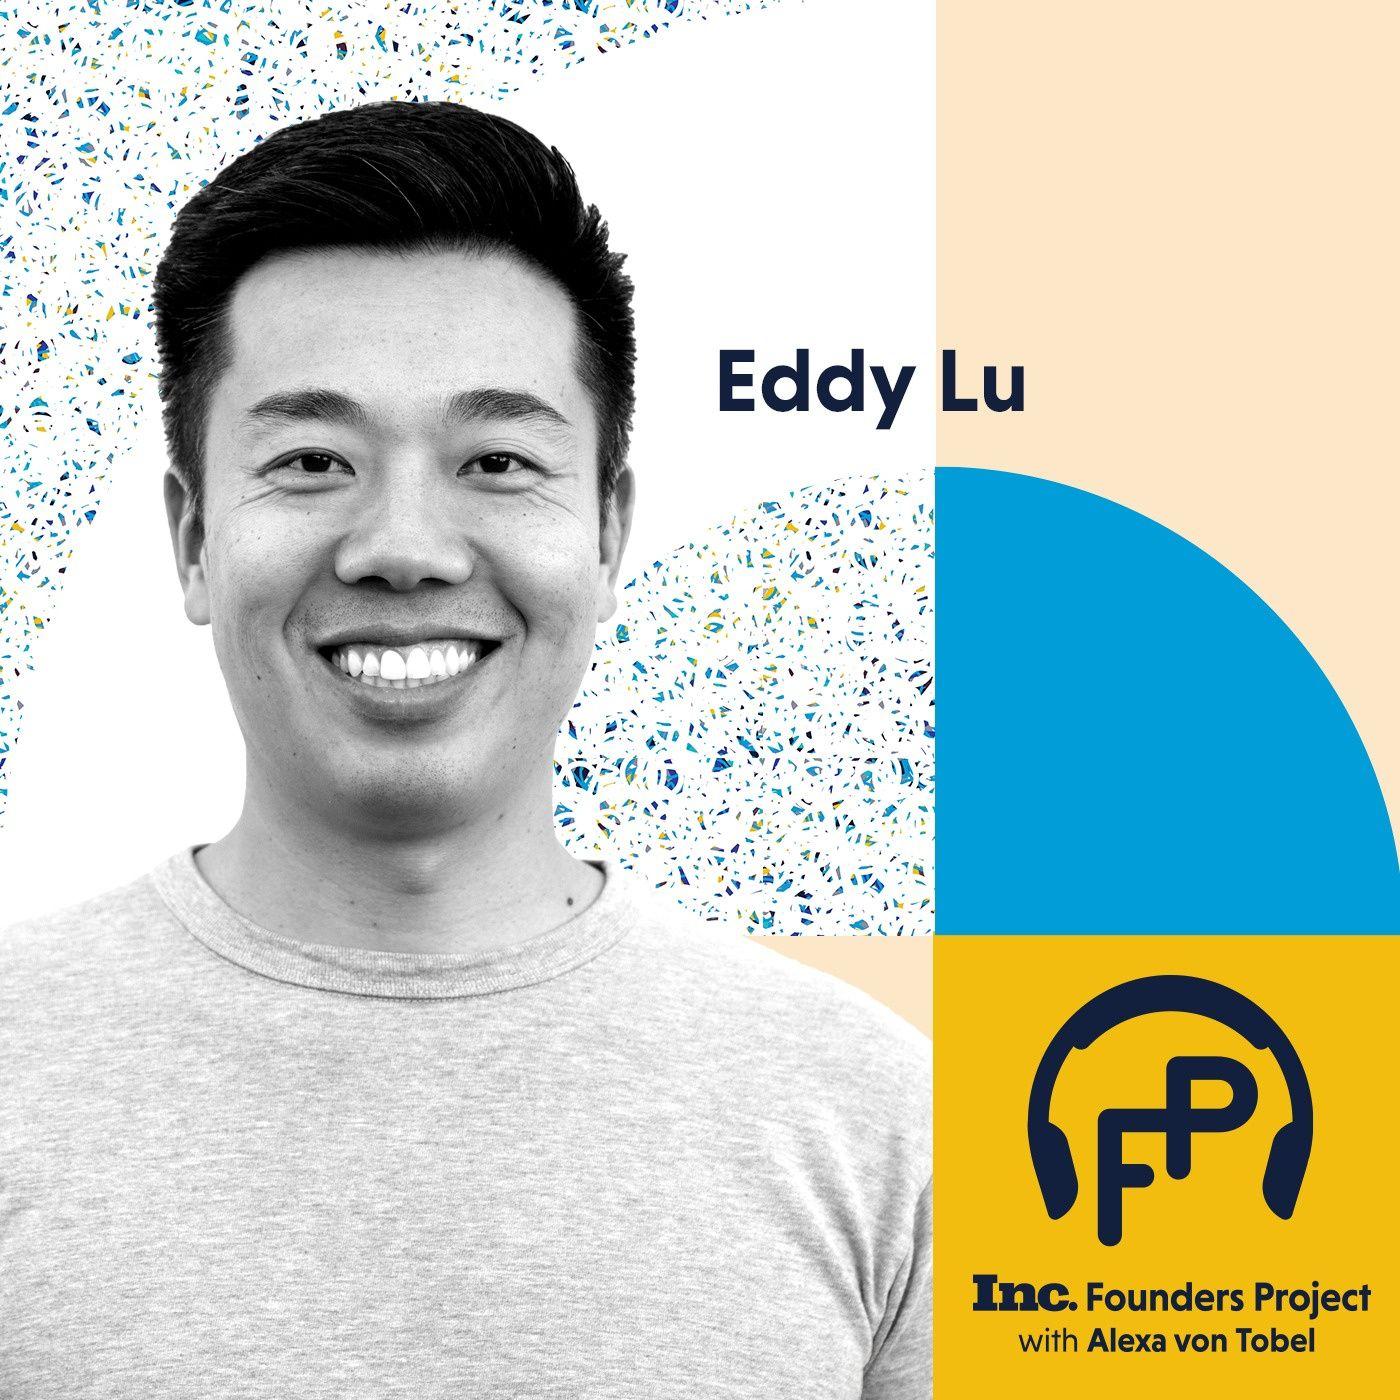 Eddy Lu of GOAT